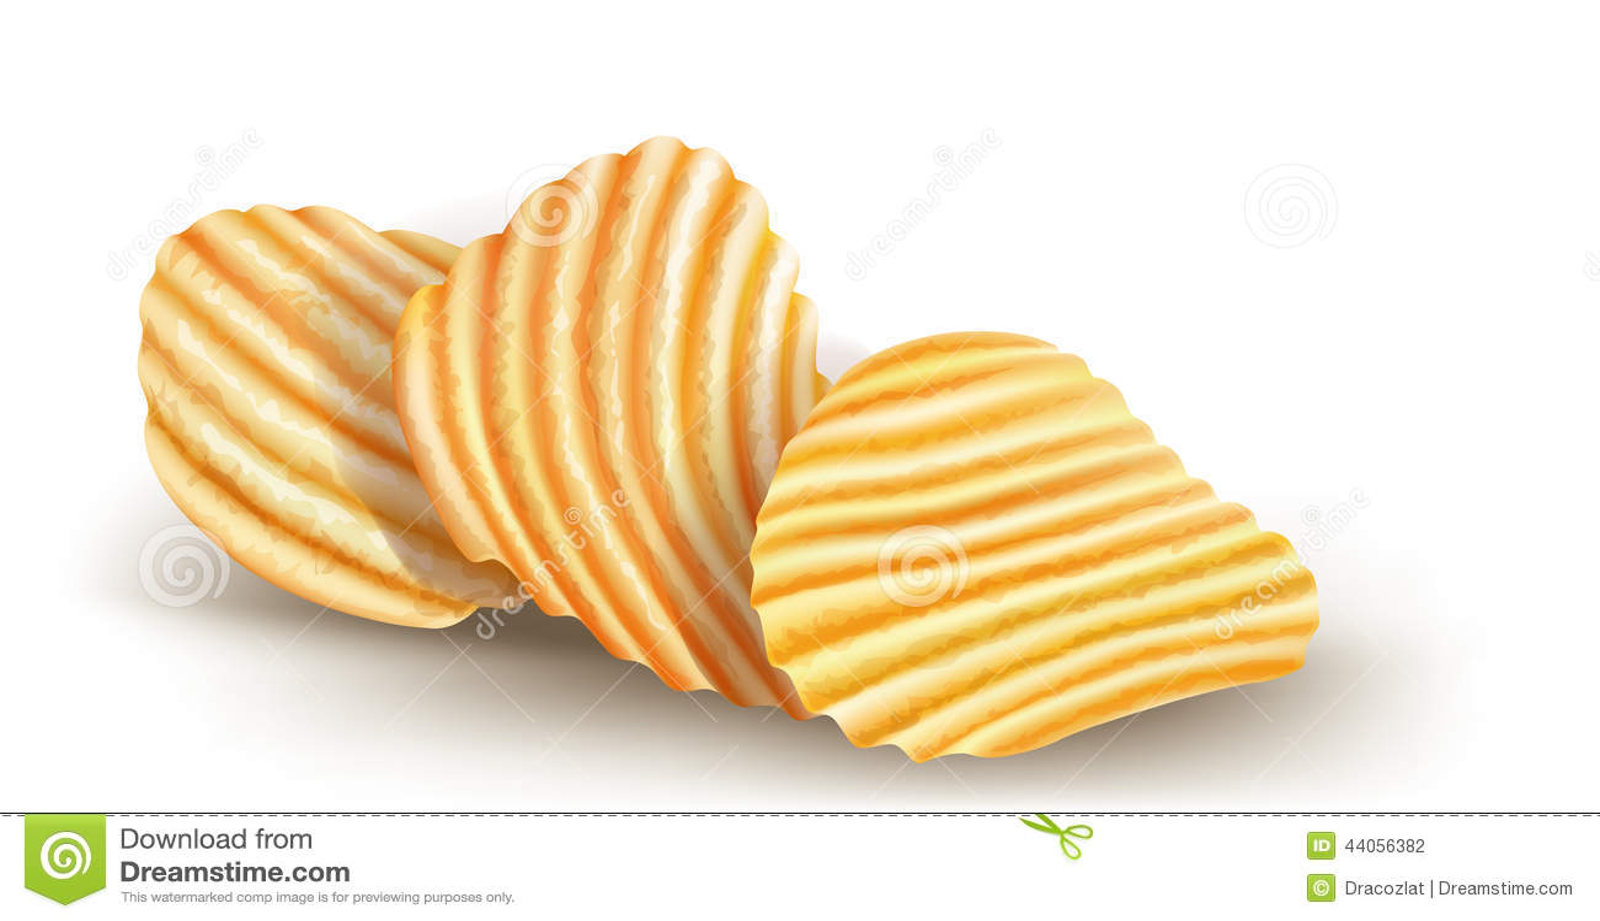 Wavy potatos chips on white background